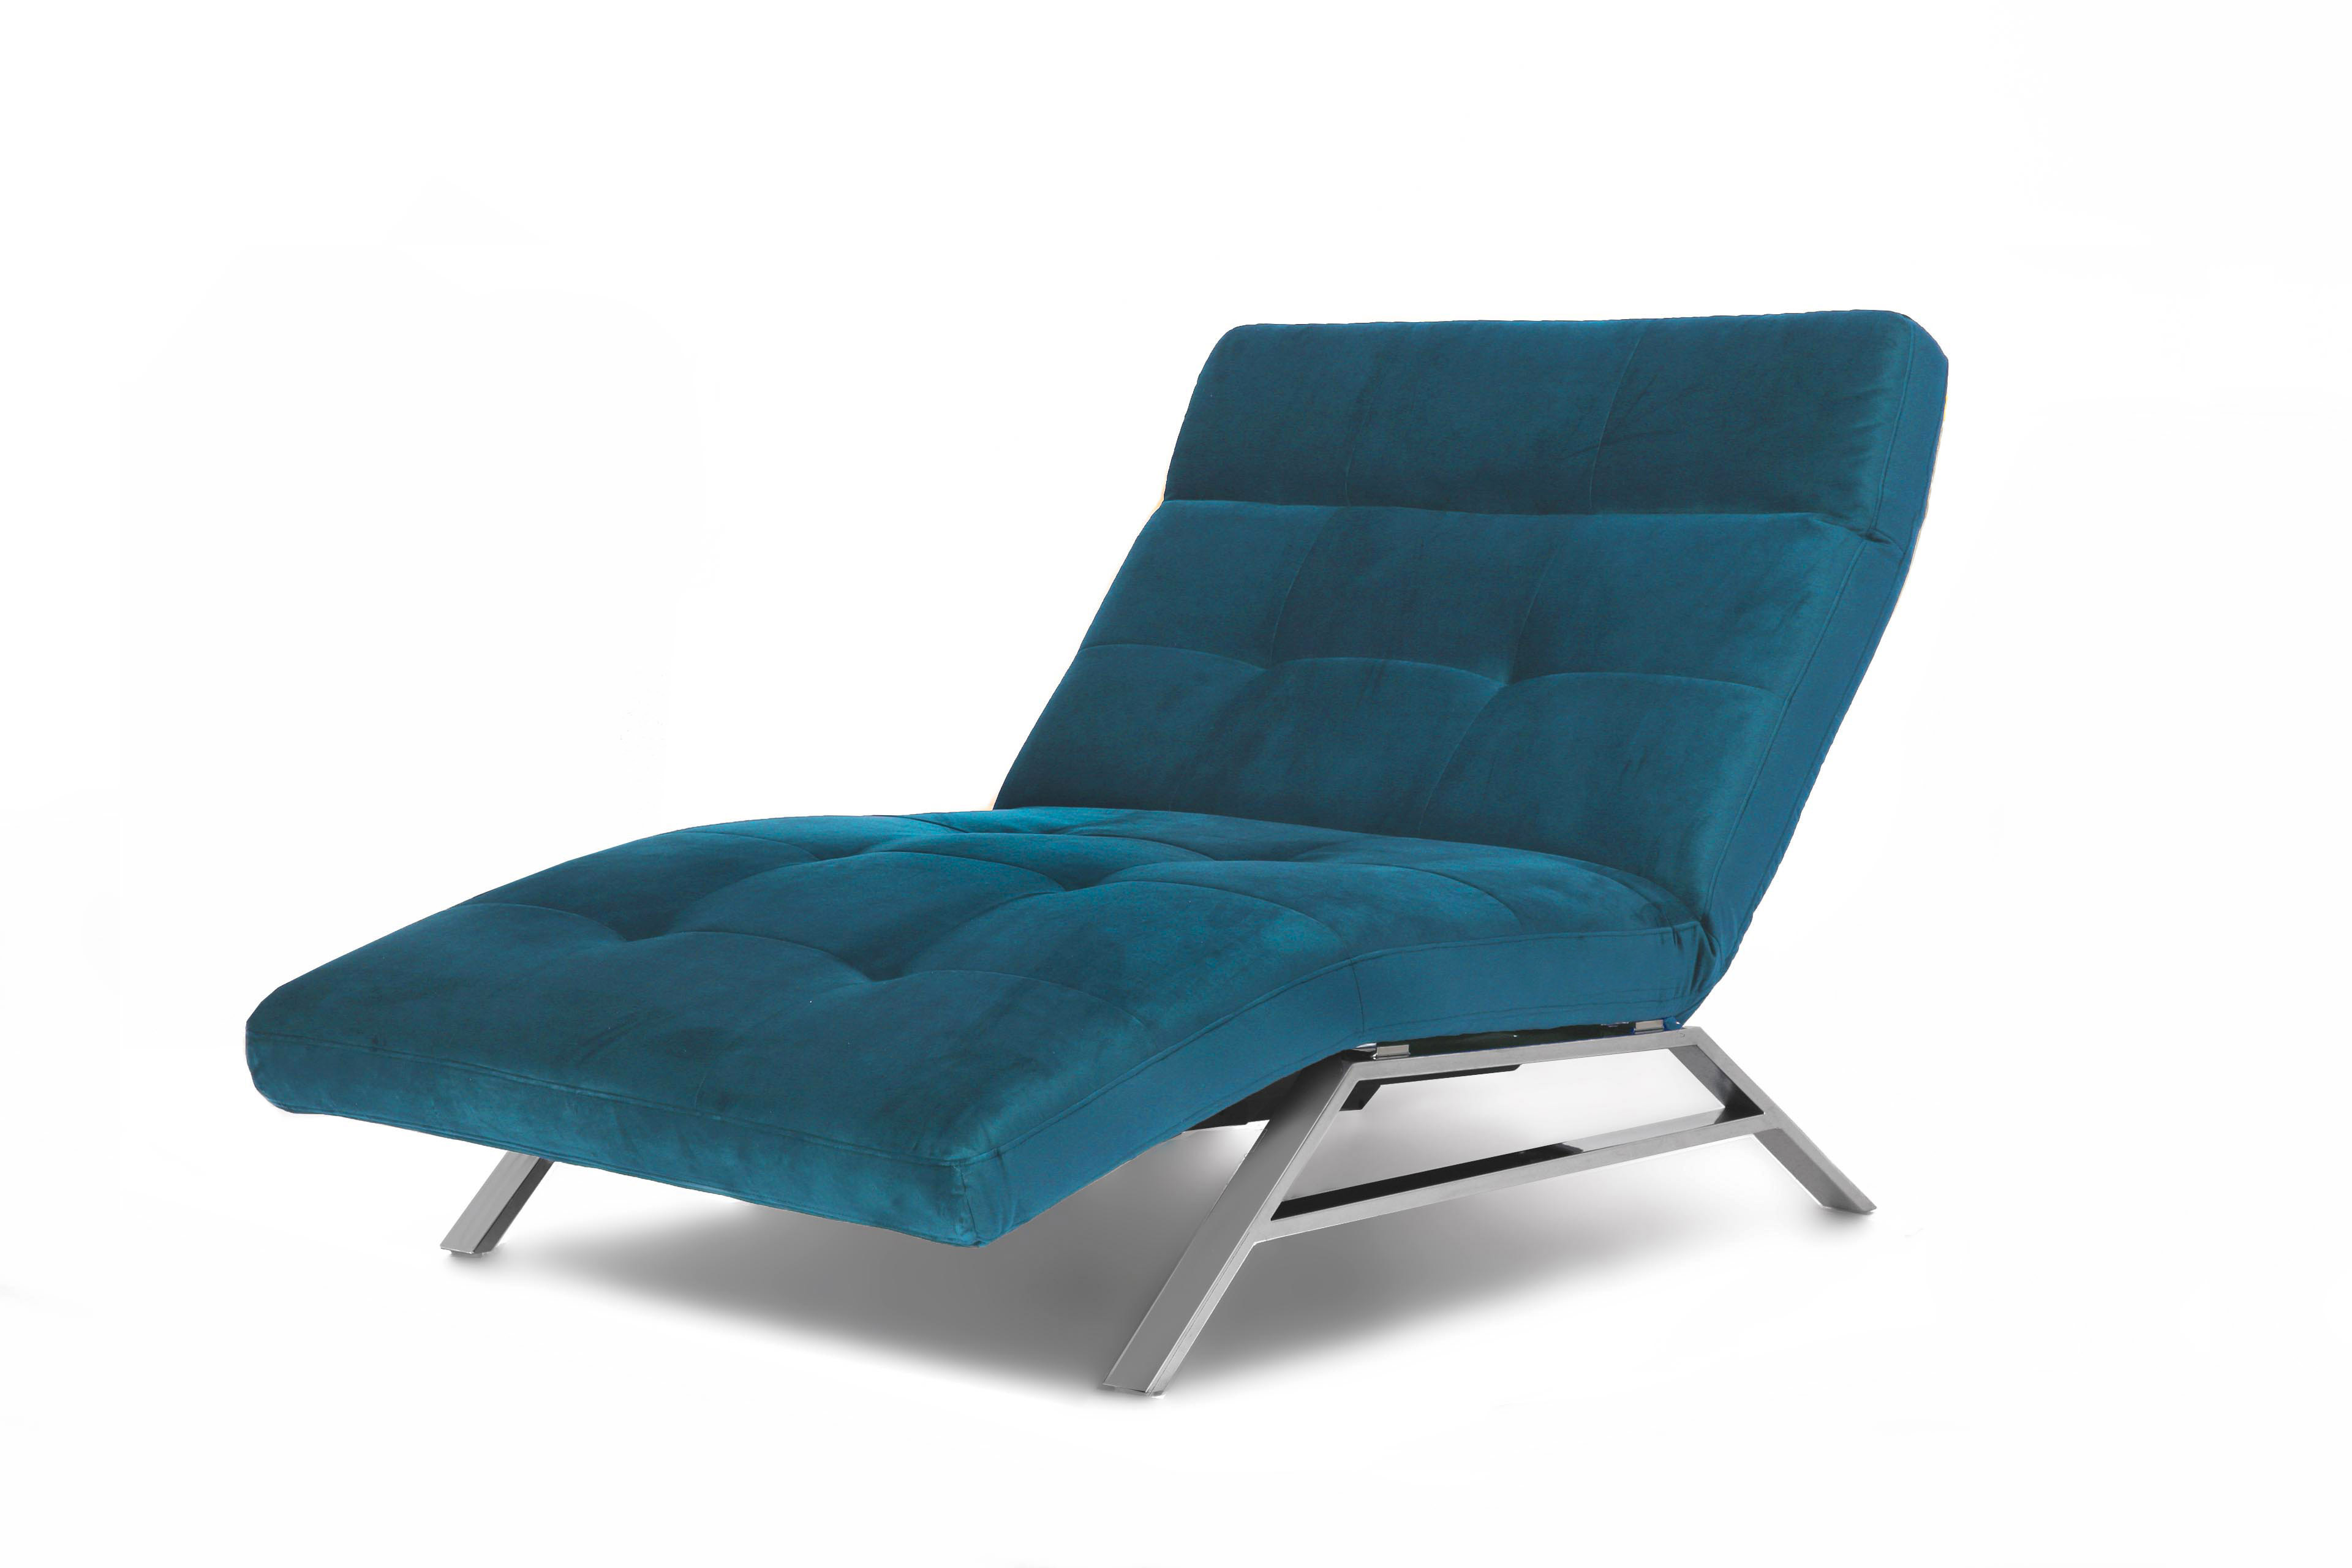 candy riviera relaxliege in petrol m bel letz ihr. Black Bedroom Furniture Sets. Home Design Ideas